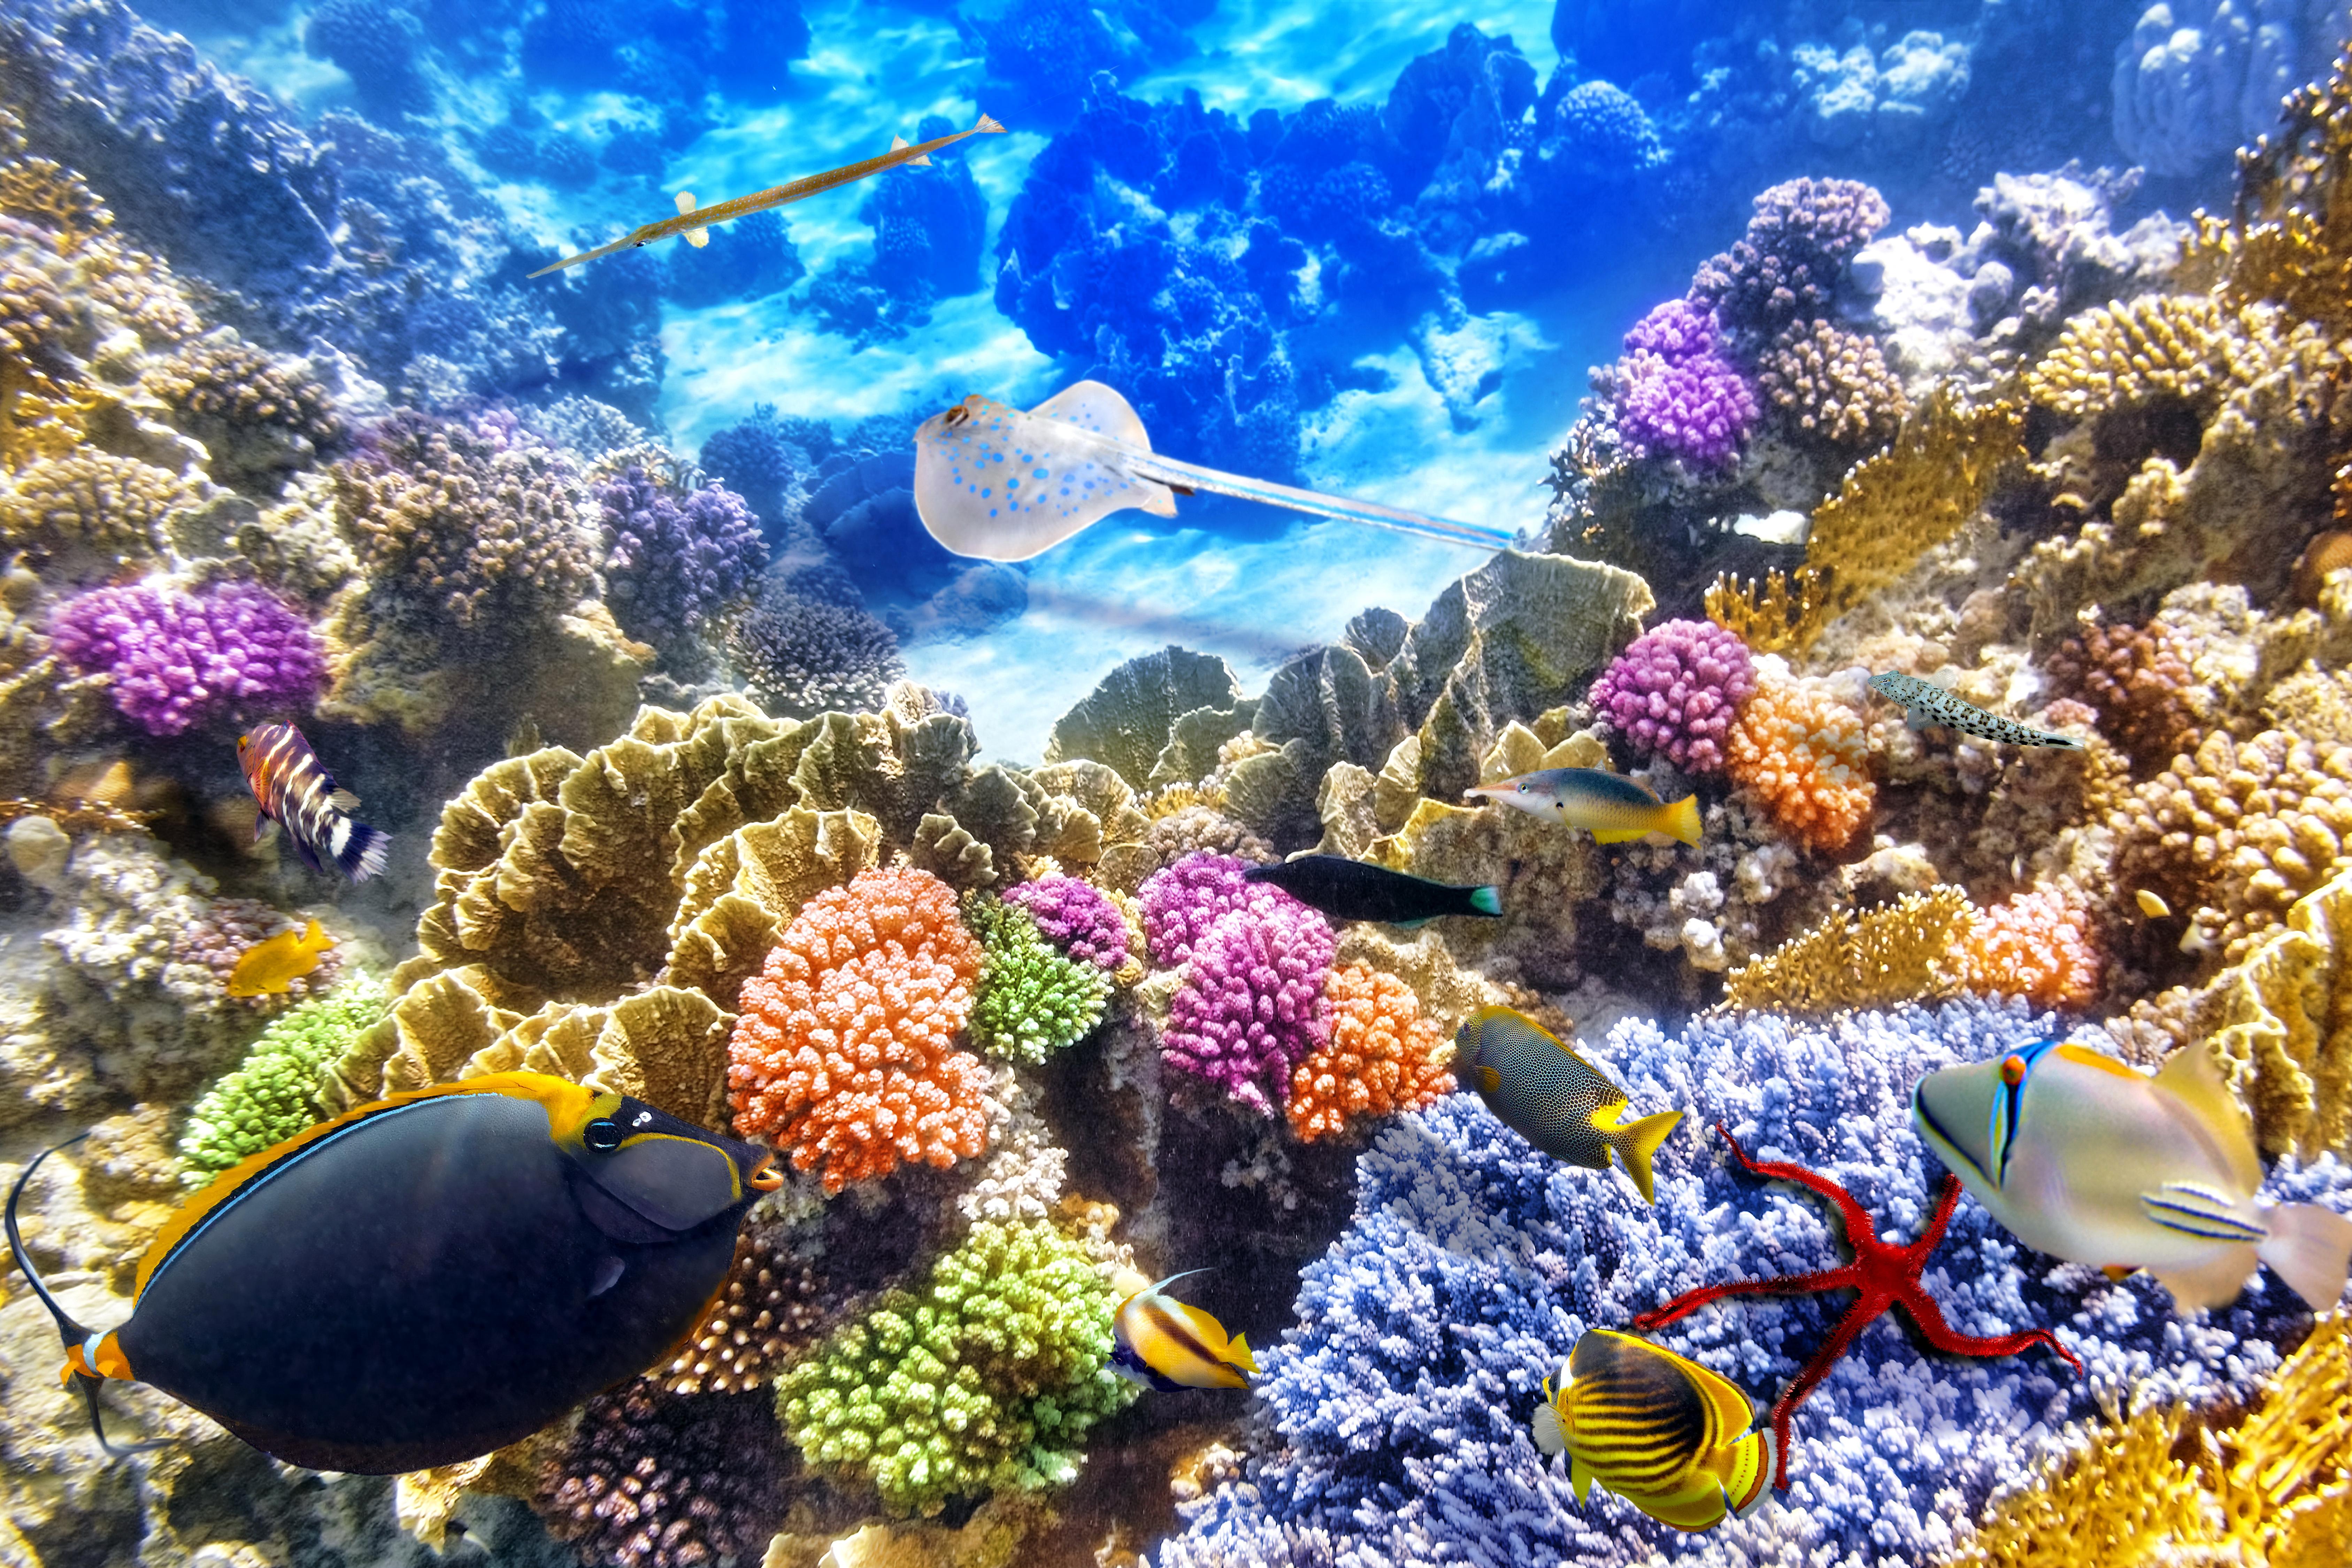 512 Underwater HD Wallpapers